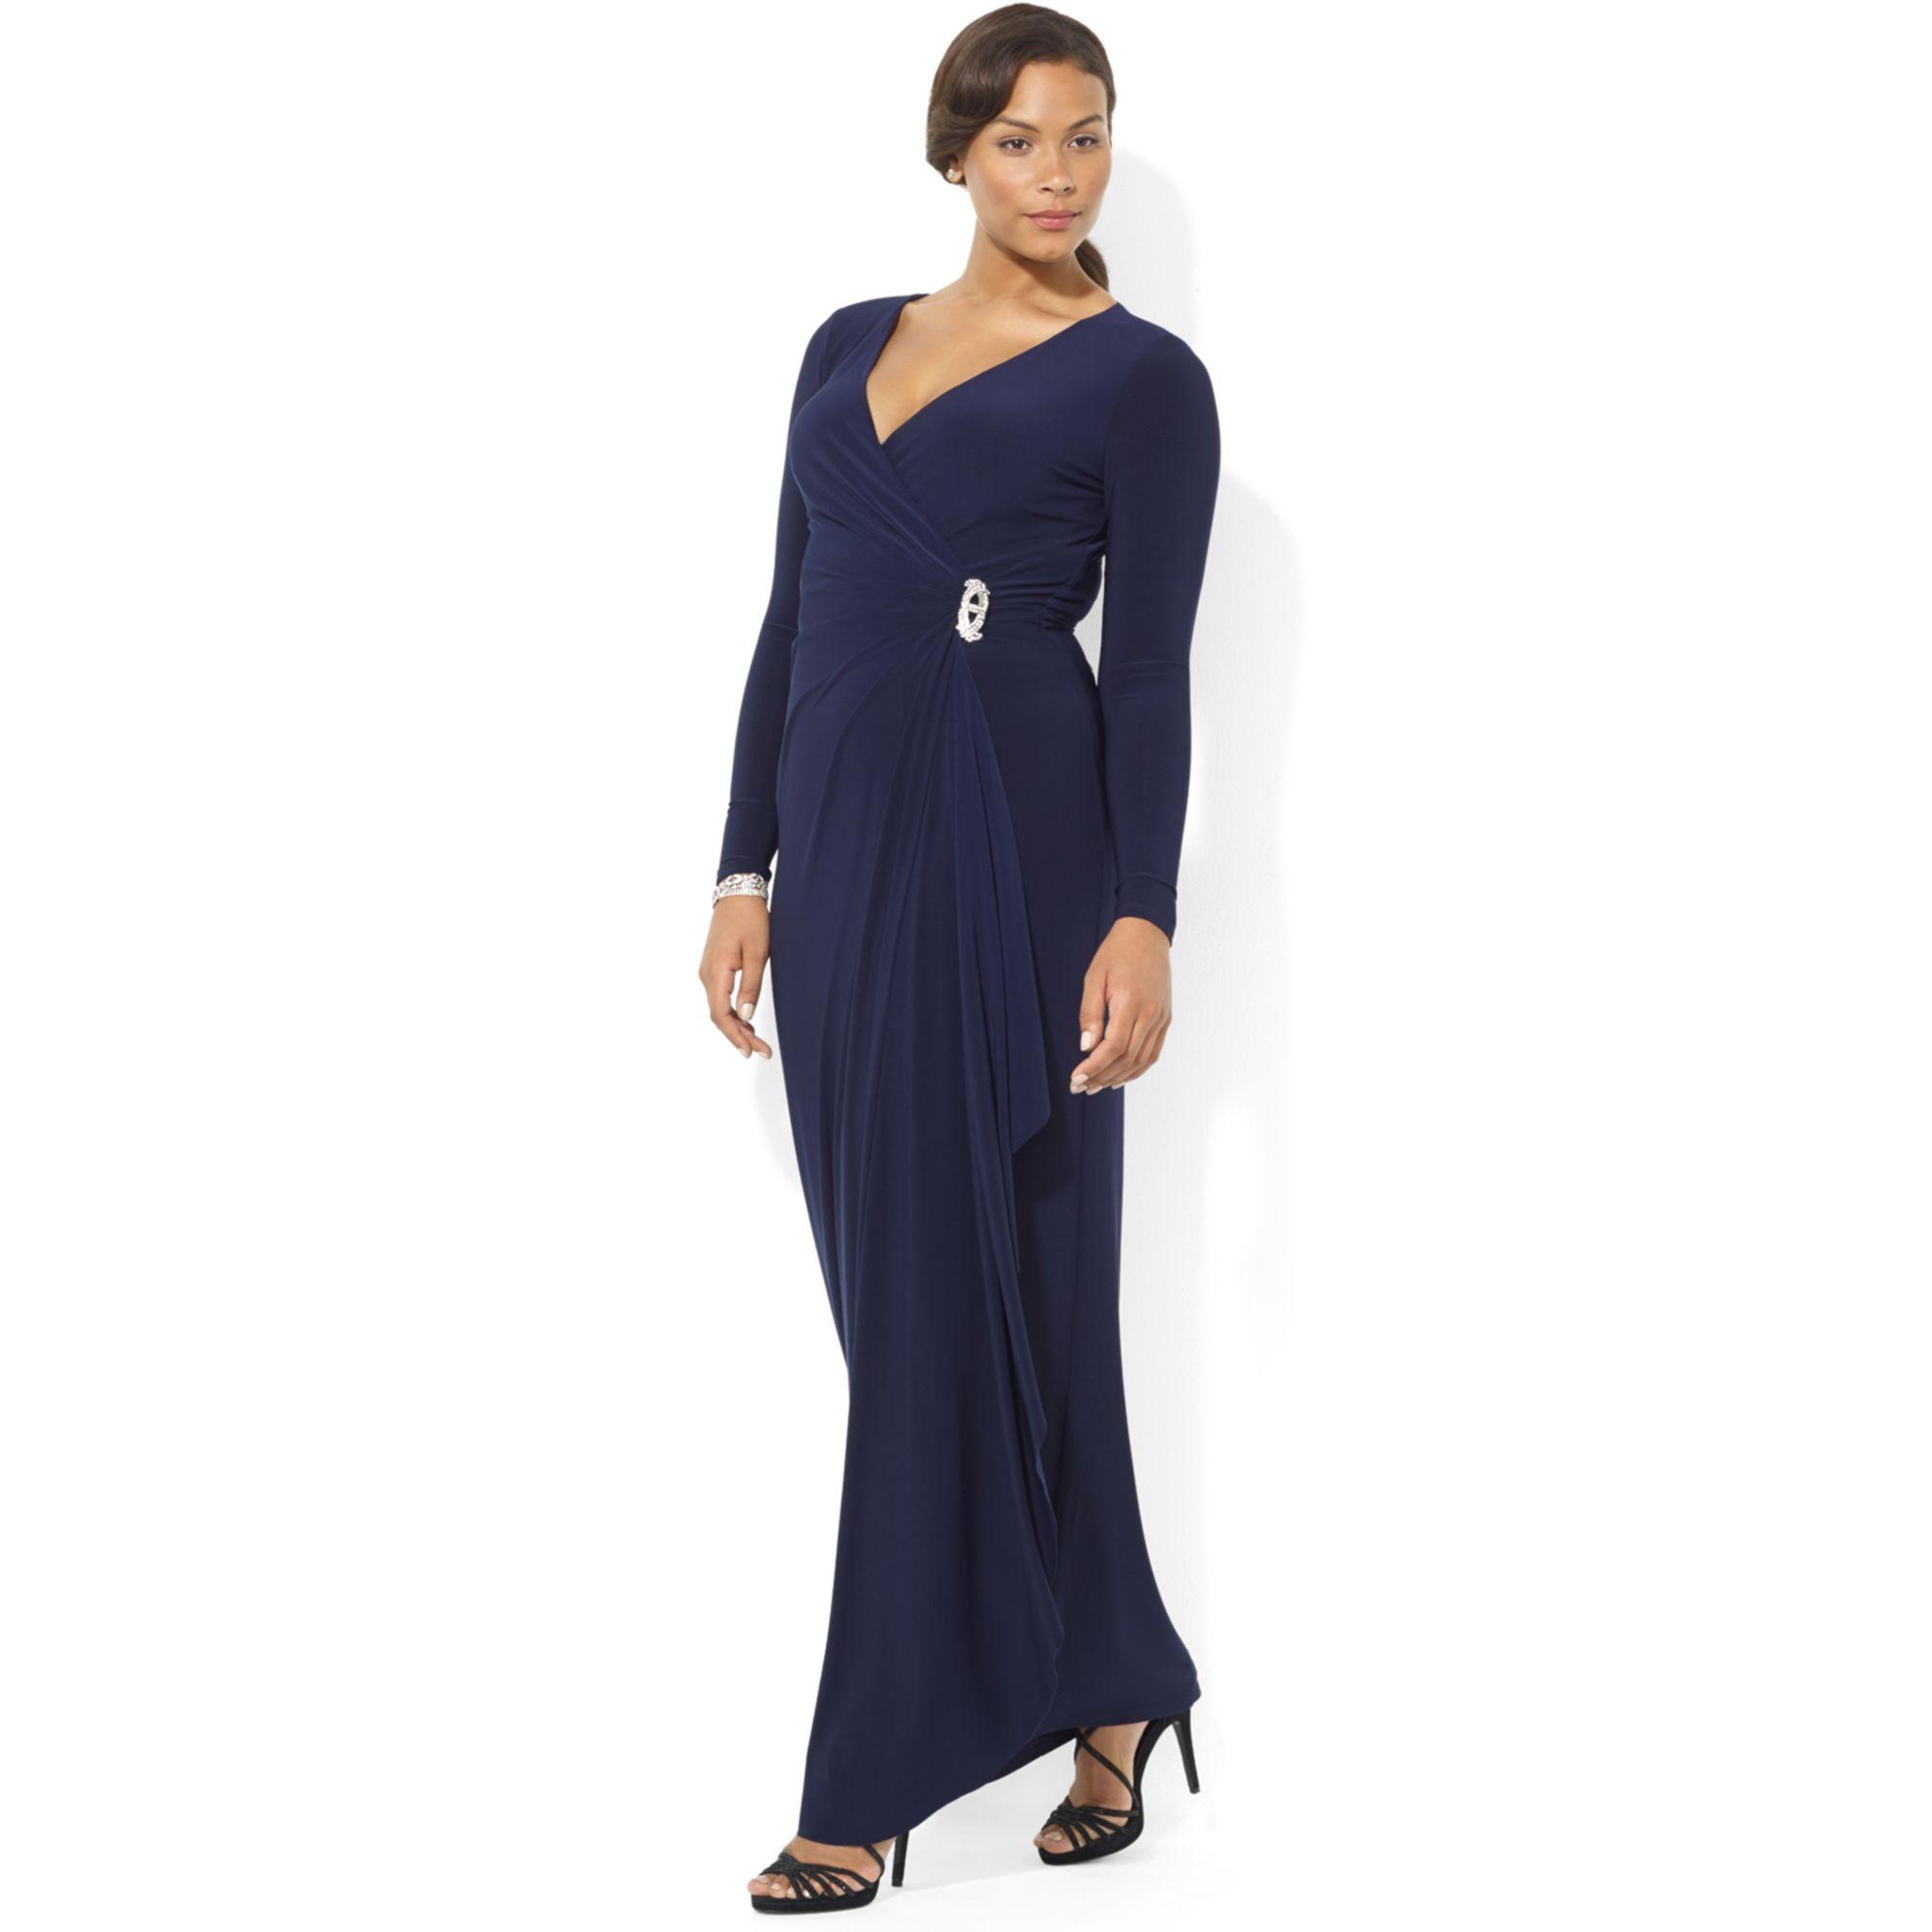 Lyst - Lauren by Ralph Lauren Long-sleeve Jersey Gown with Brooch in ... 18b37a33a